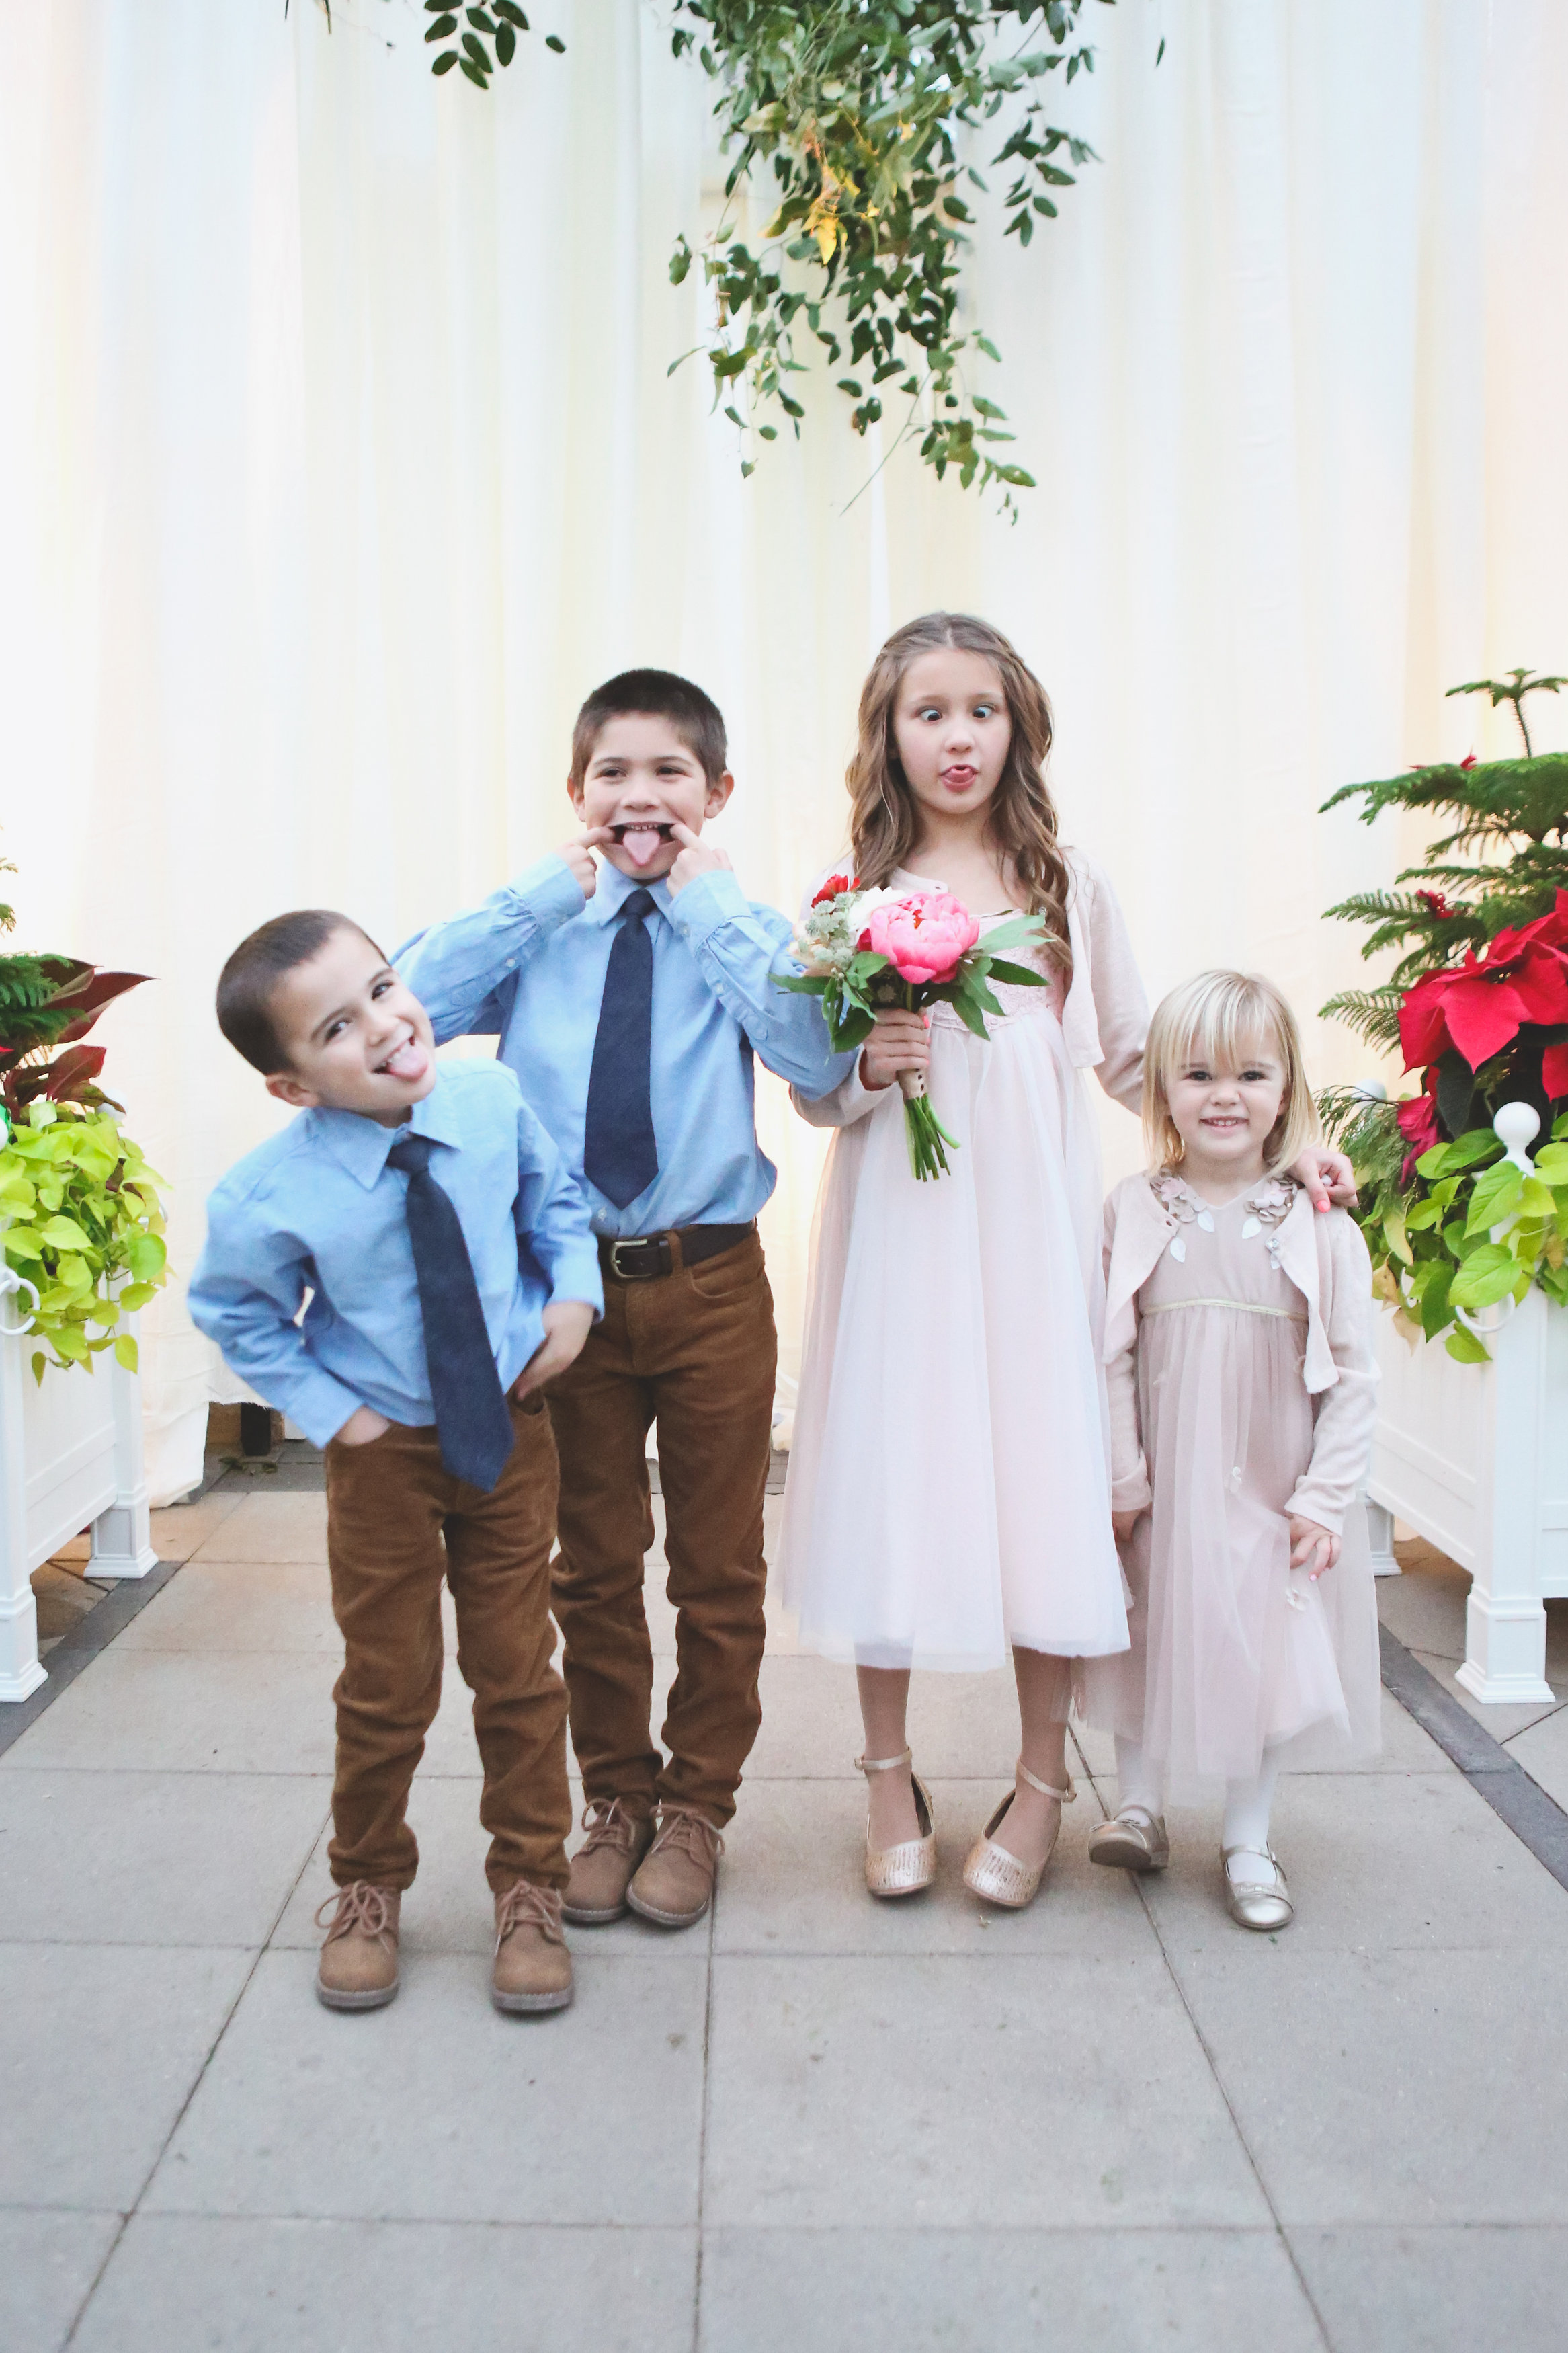 HannahHudsonPhotography.JessieandJustin.WeddingParty-86.jpeg